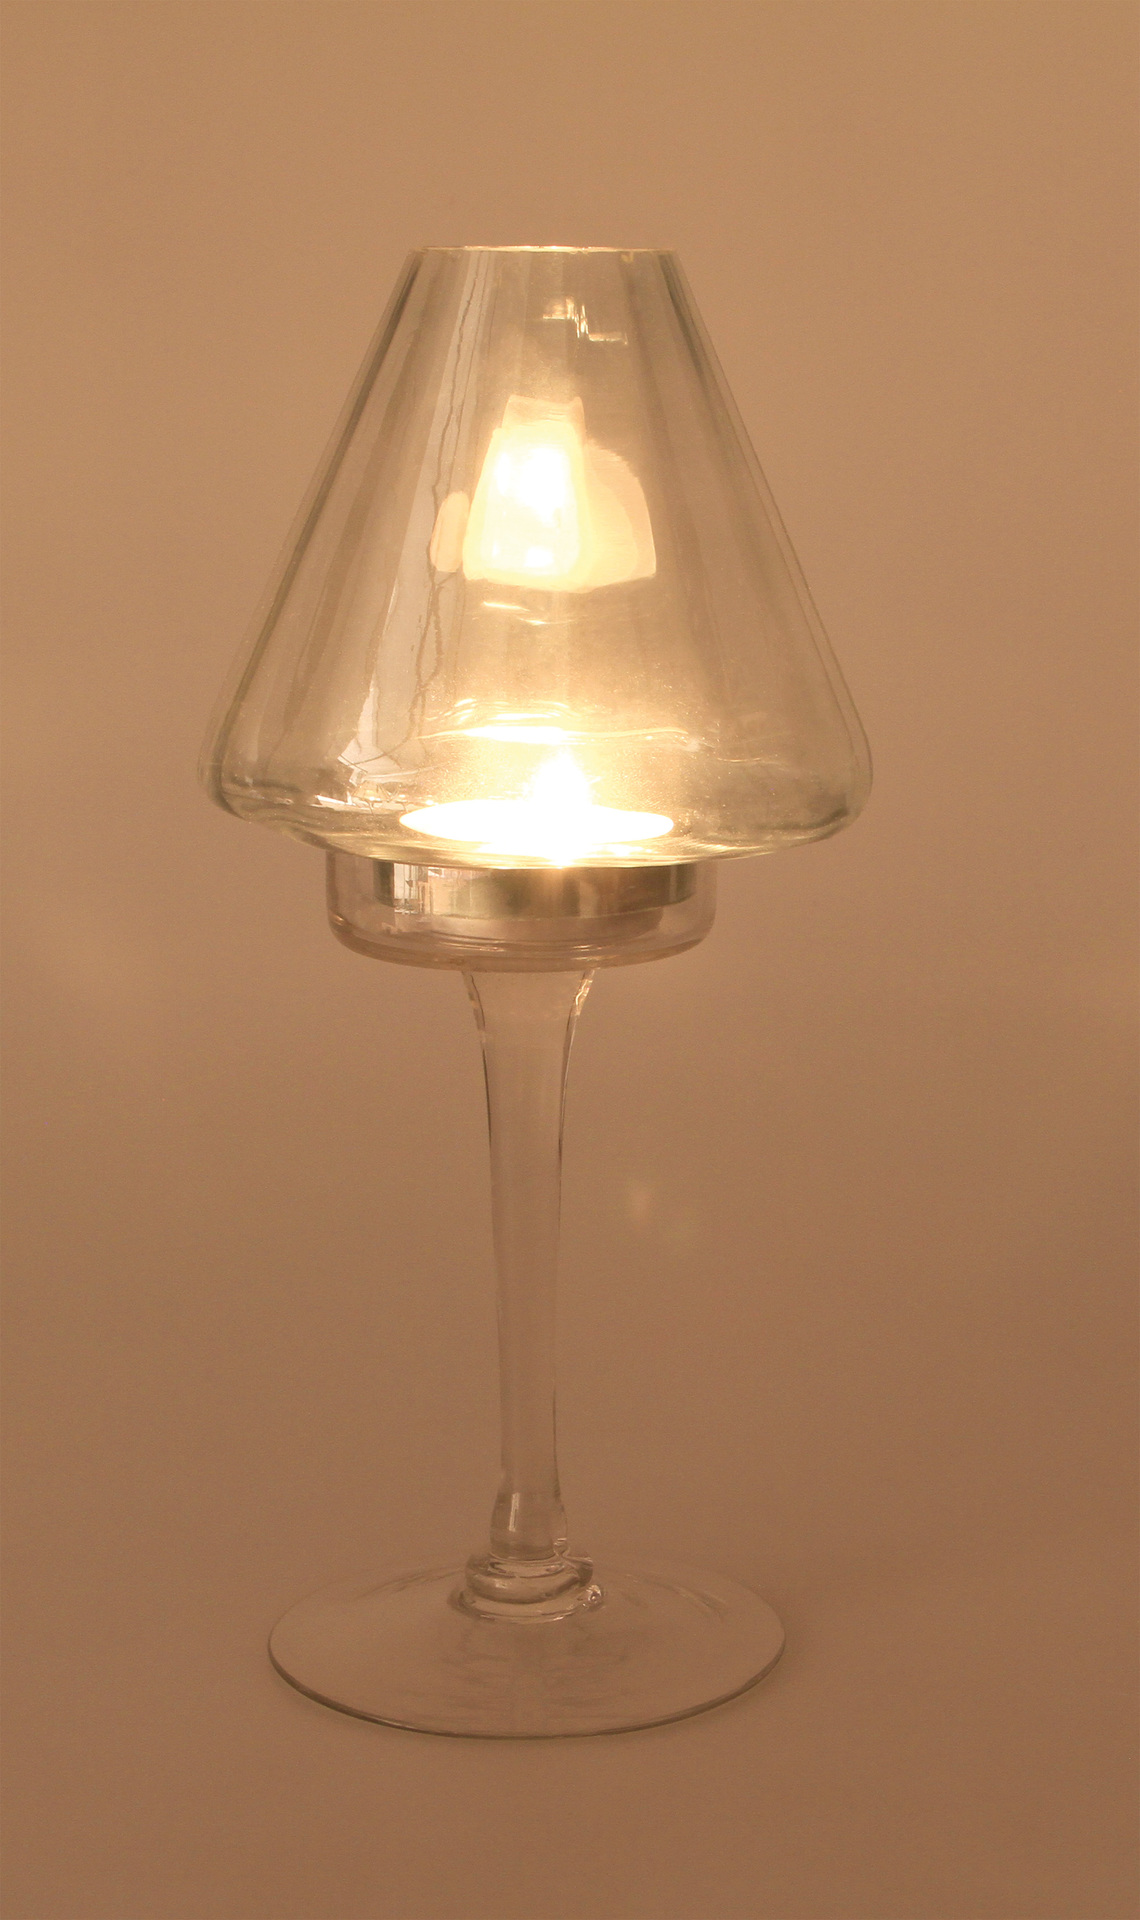 Elegantný svietnik v tvare lampičky